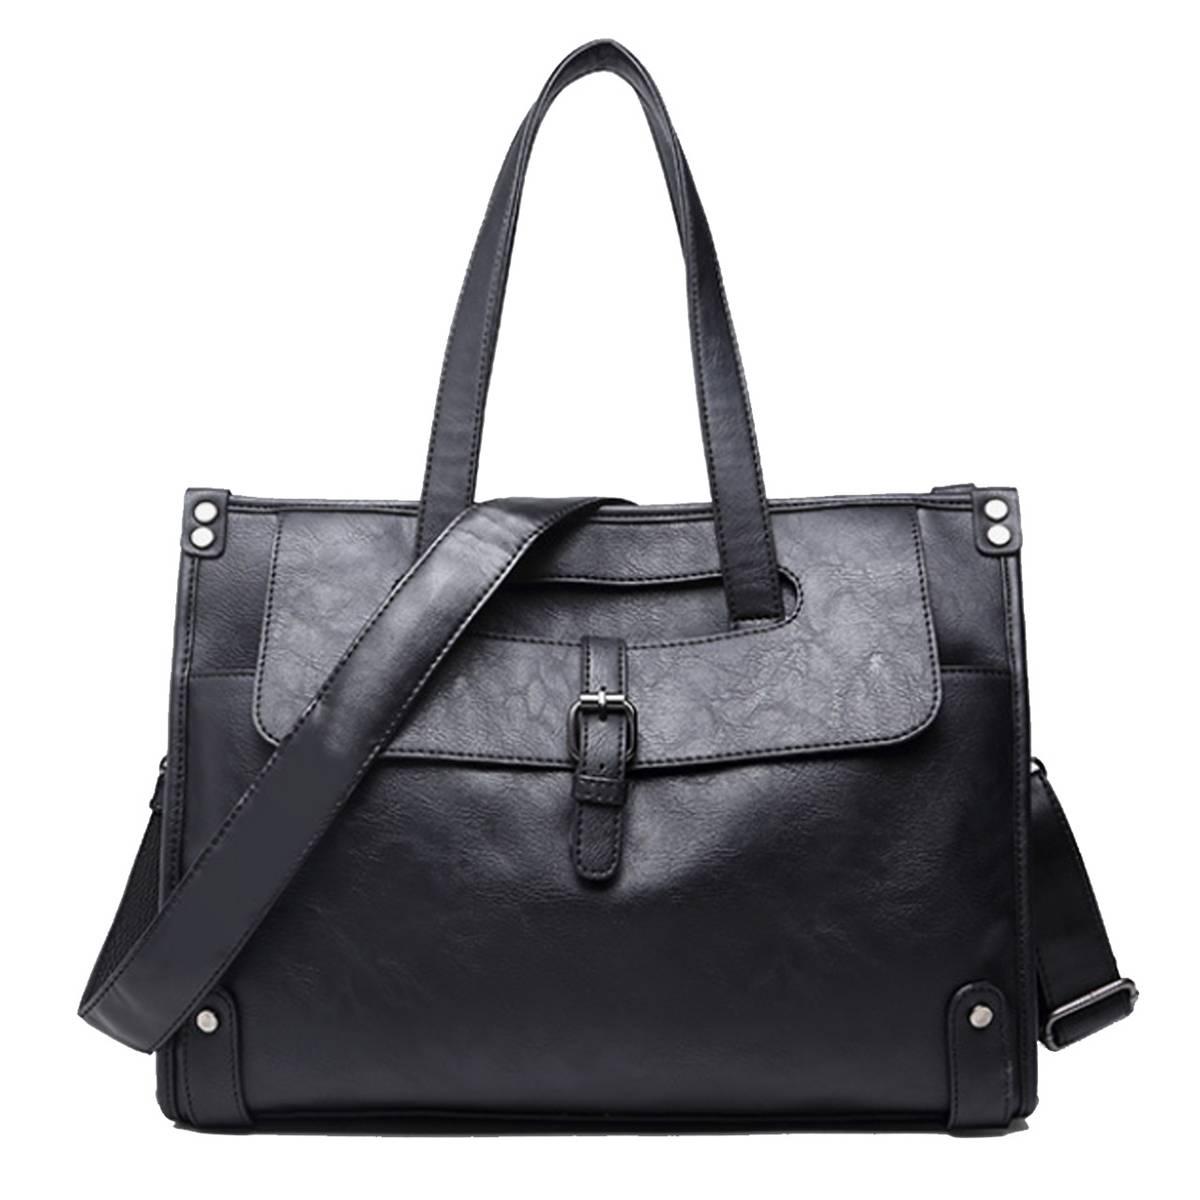 Business Men's Briefcases Men's Bag Leather Messenger Bags 14inch Laptop Bag Leather Handbag Fashion Crossbody Bag For Men New